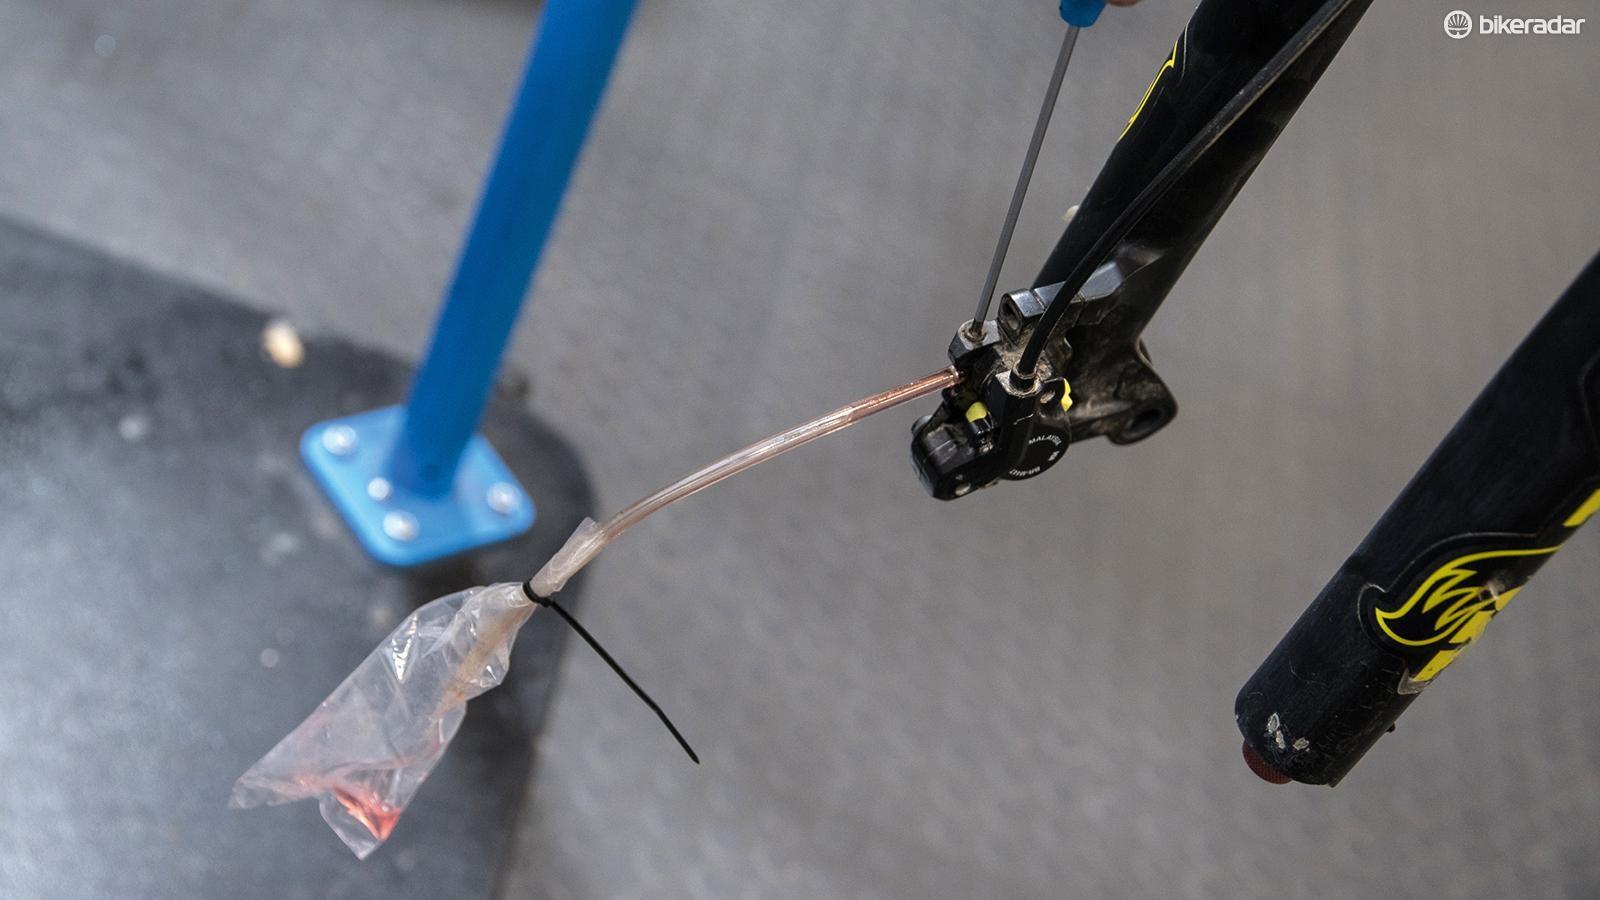 Shimano disc brake bleeding procedure — step-by-step guide